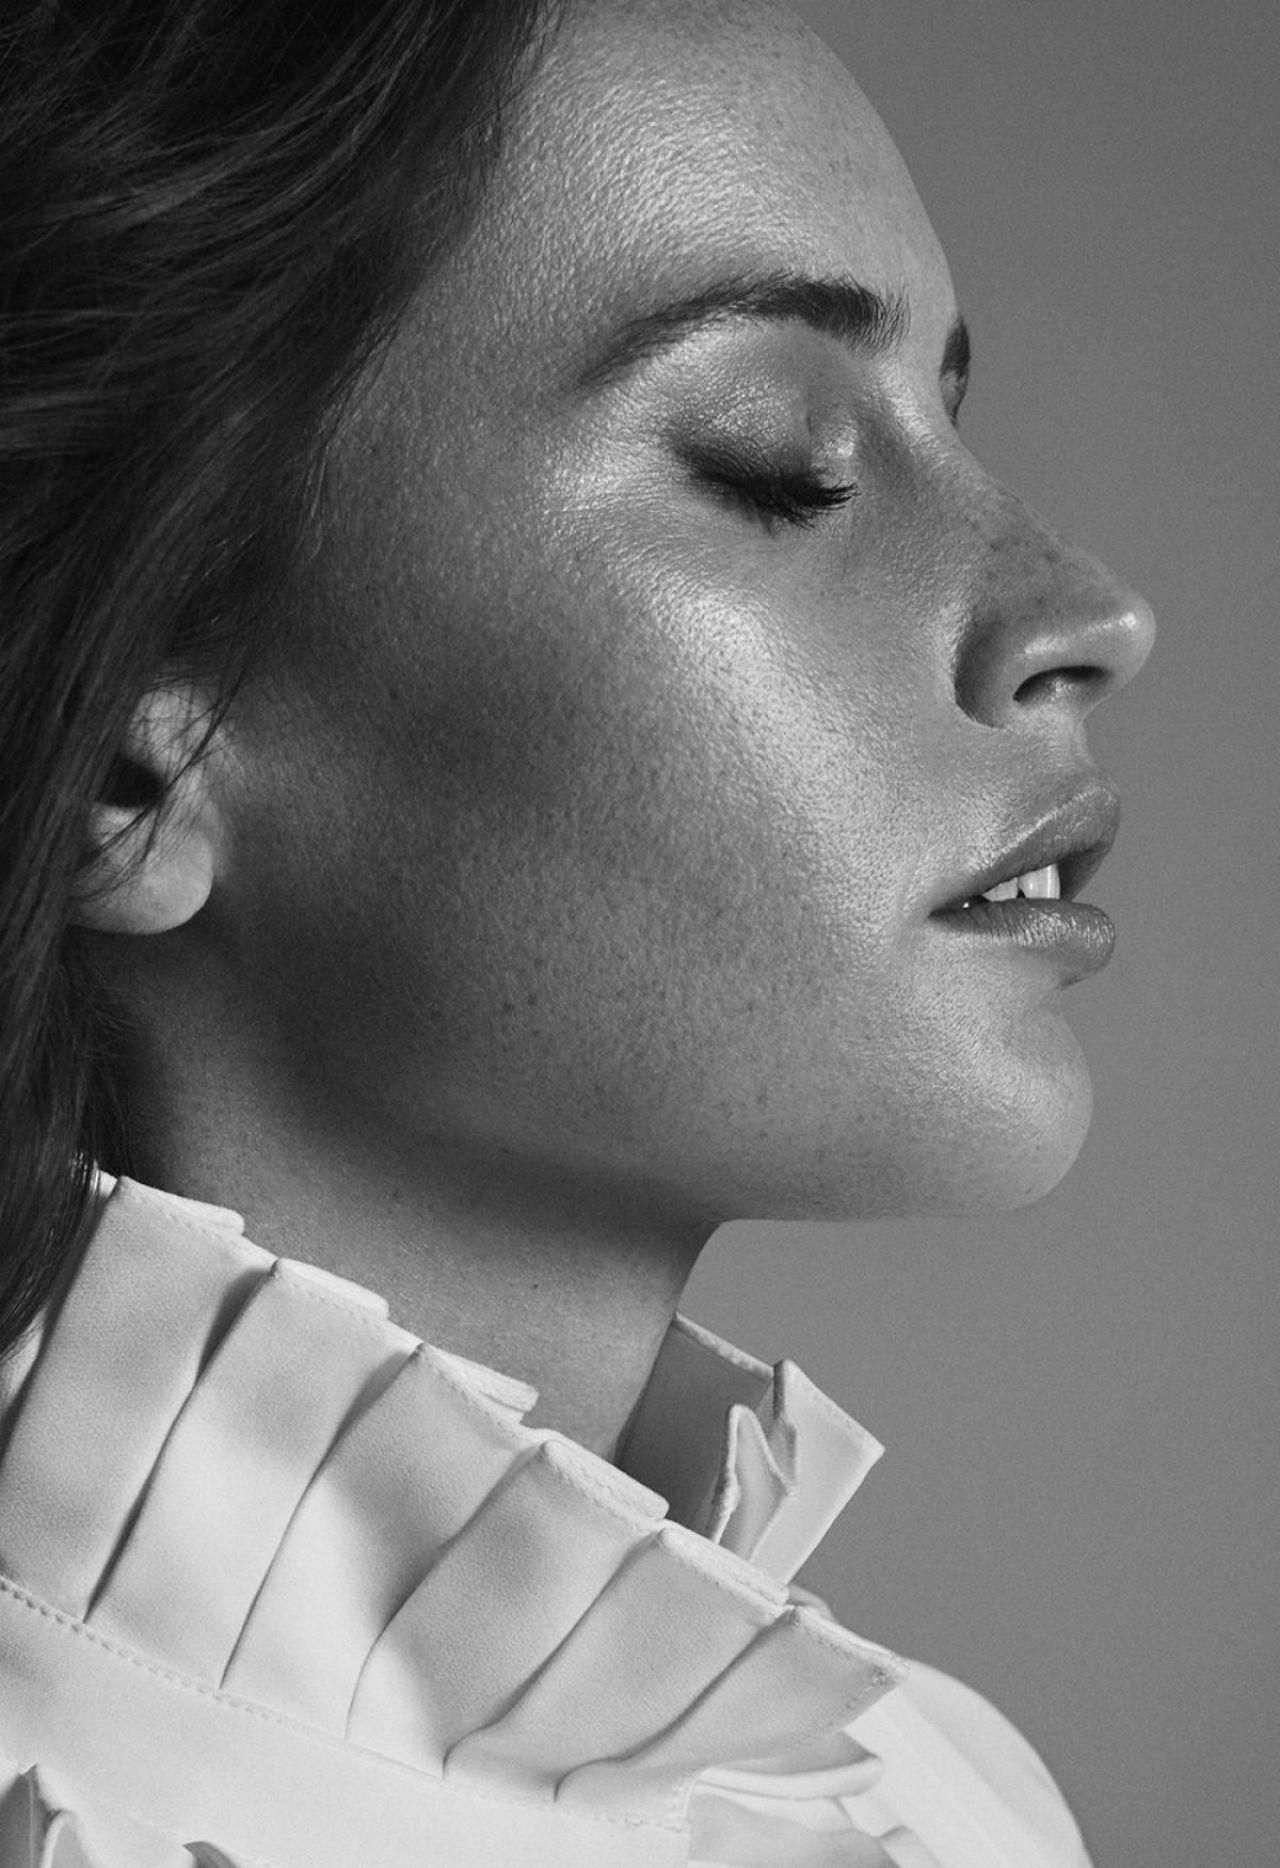 https://celebmafia.com/wp-content/uploads/2018/11/felicity-jones-s-magazine-winter-2019-0.jpg